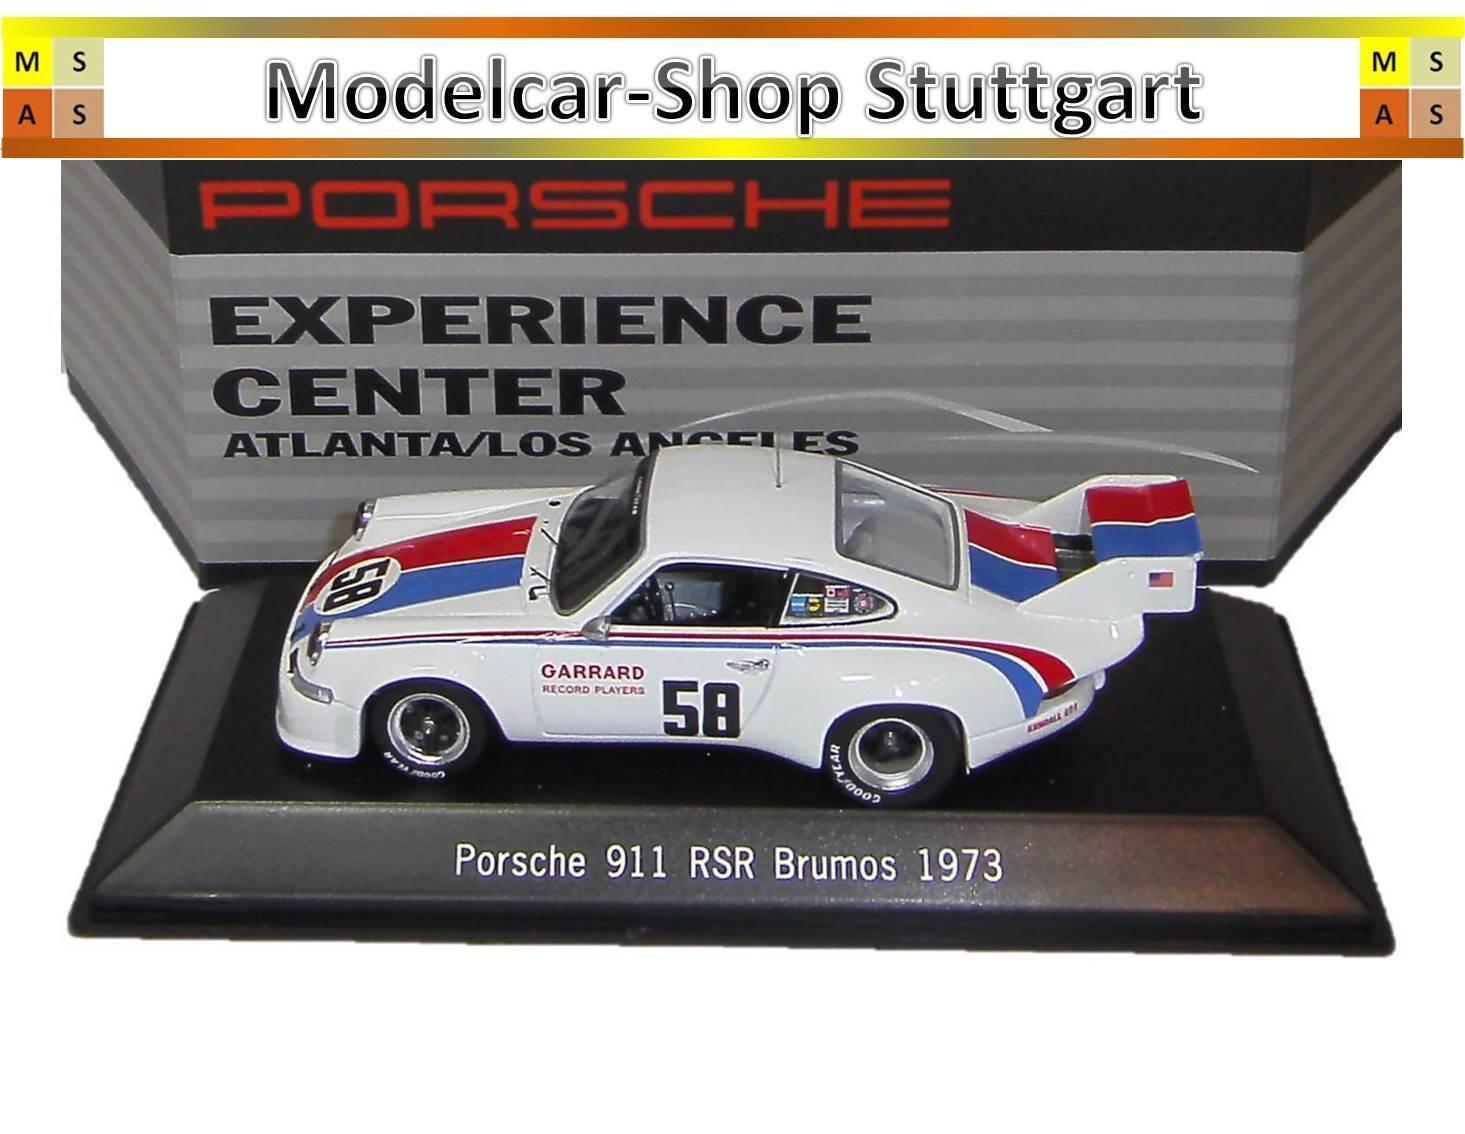 Musée Porsche 911 RSR Brumos 1973 Experience Center Atlanta L.A. Spark 1 43